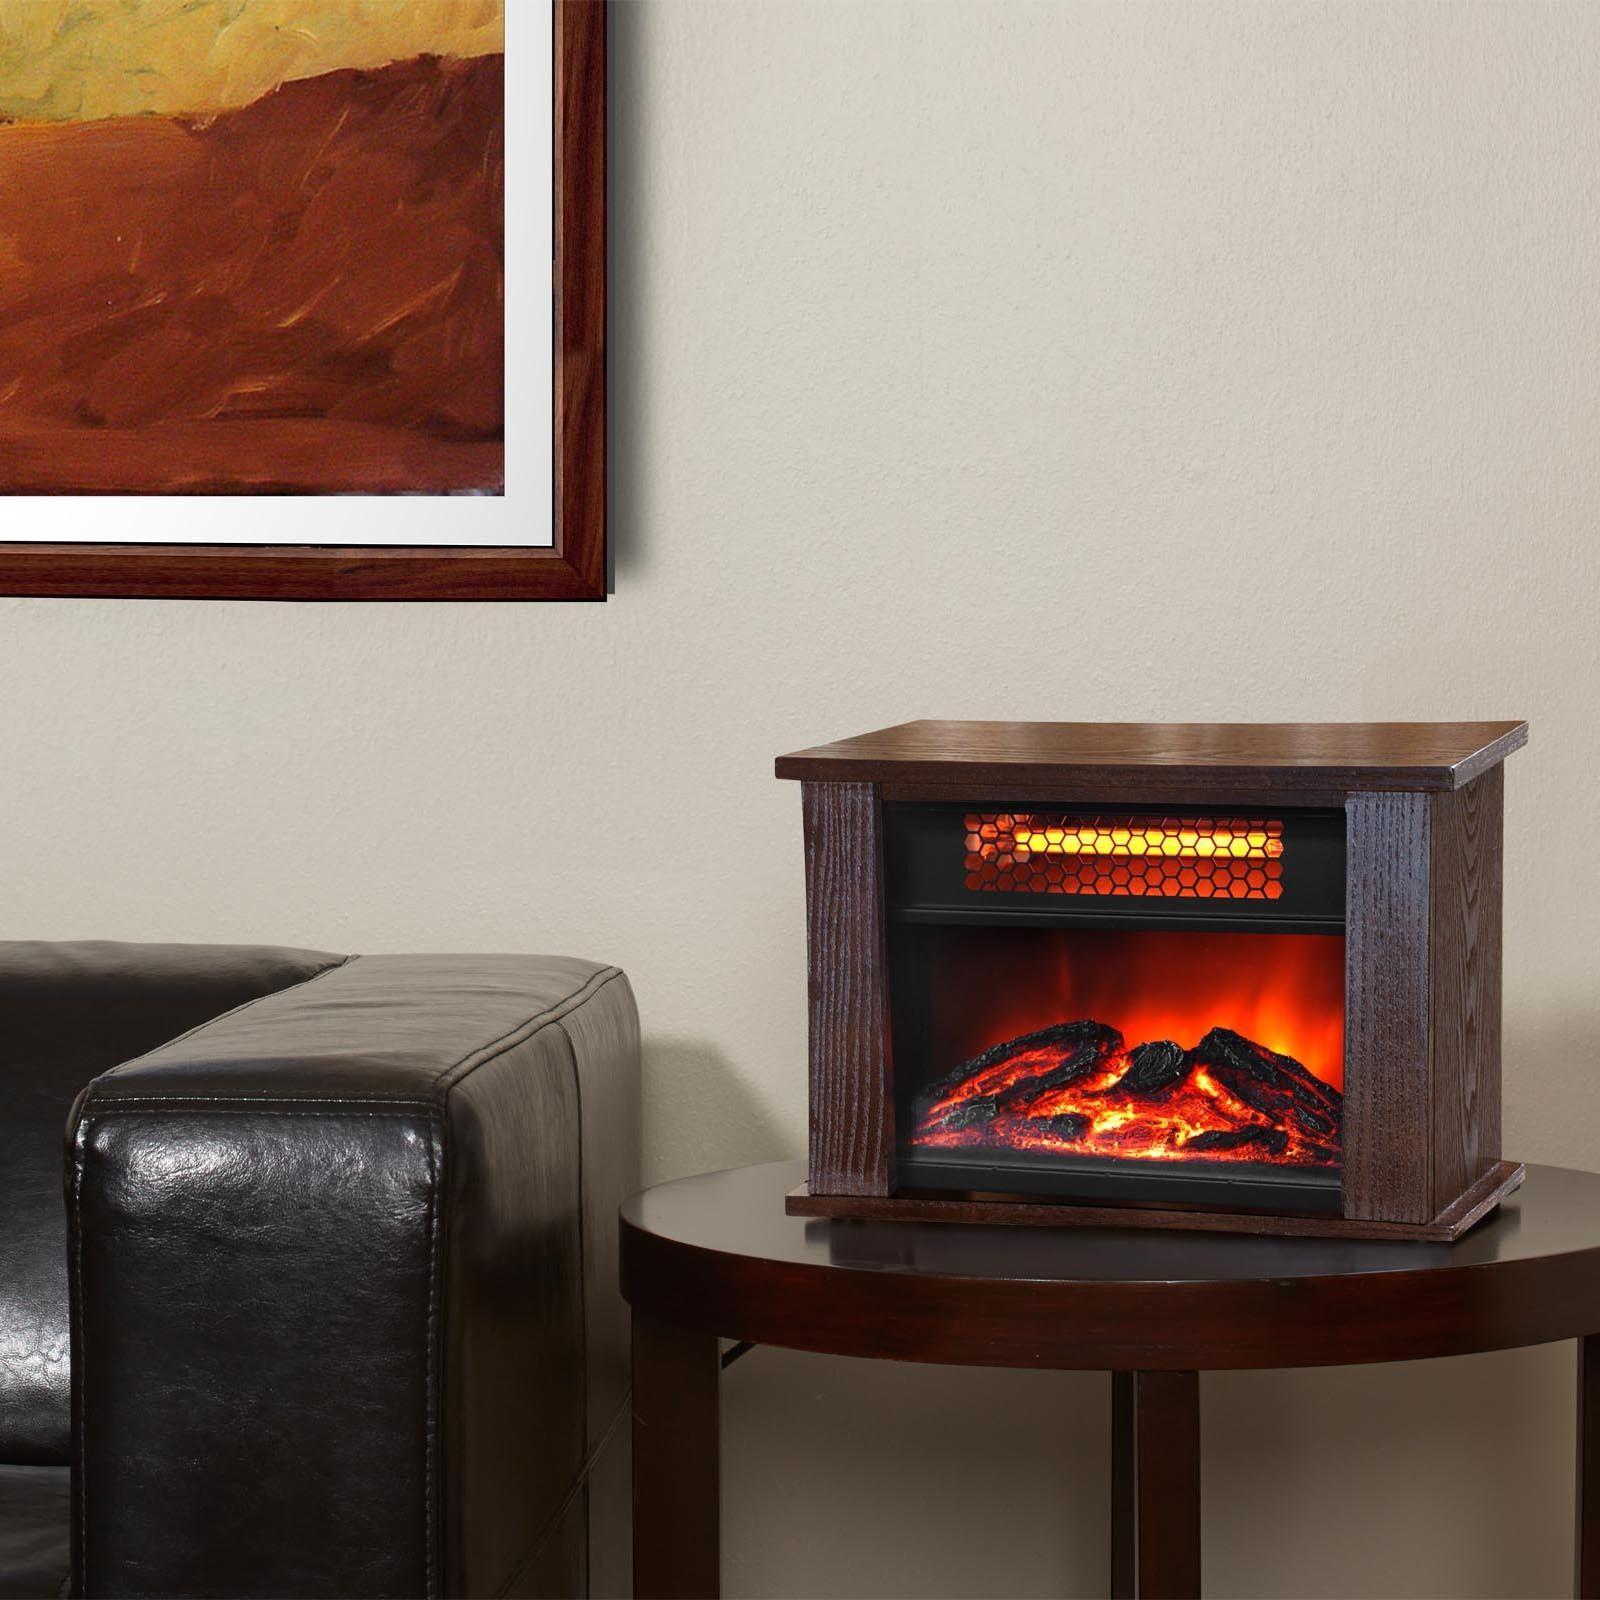 750 Watt Infrared Mini Fireplace Heater